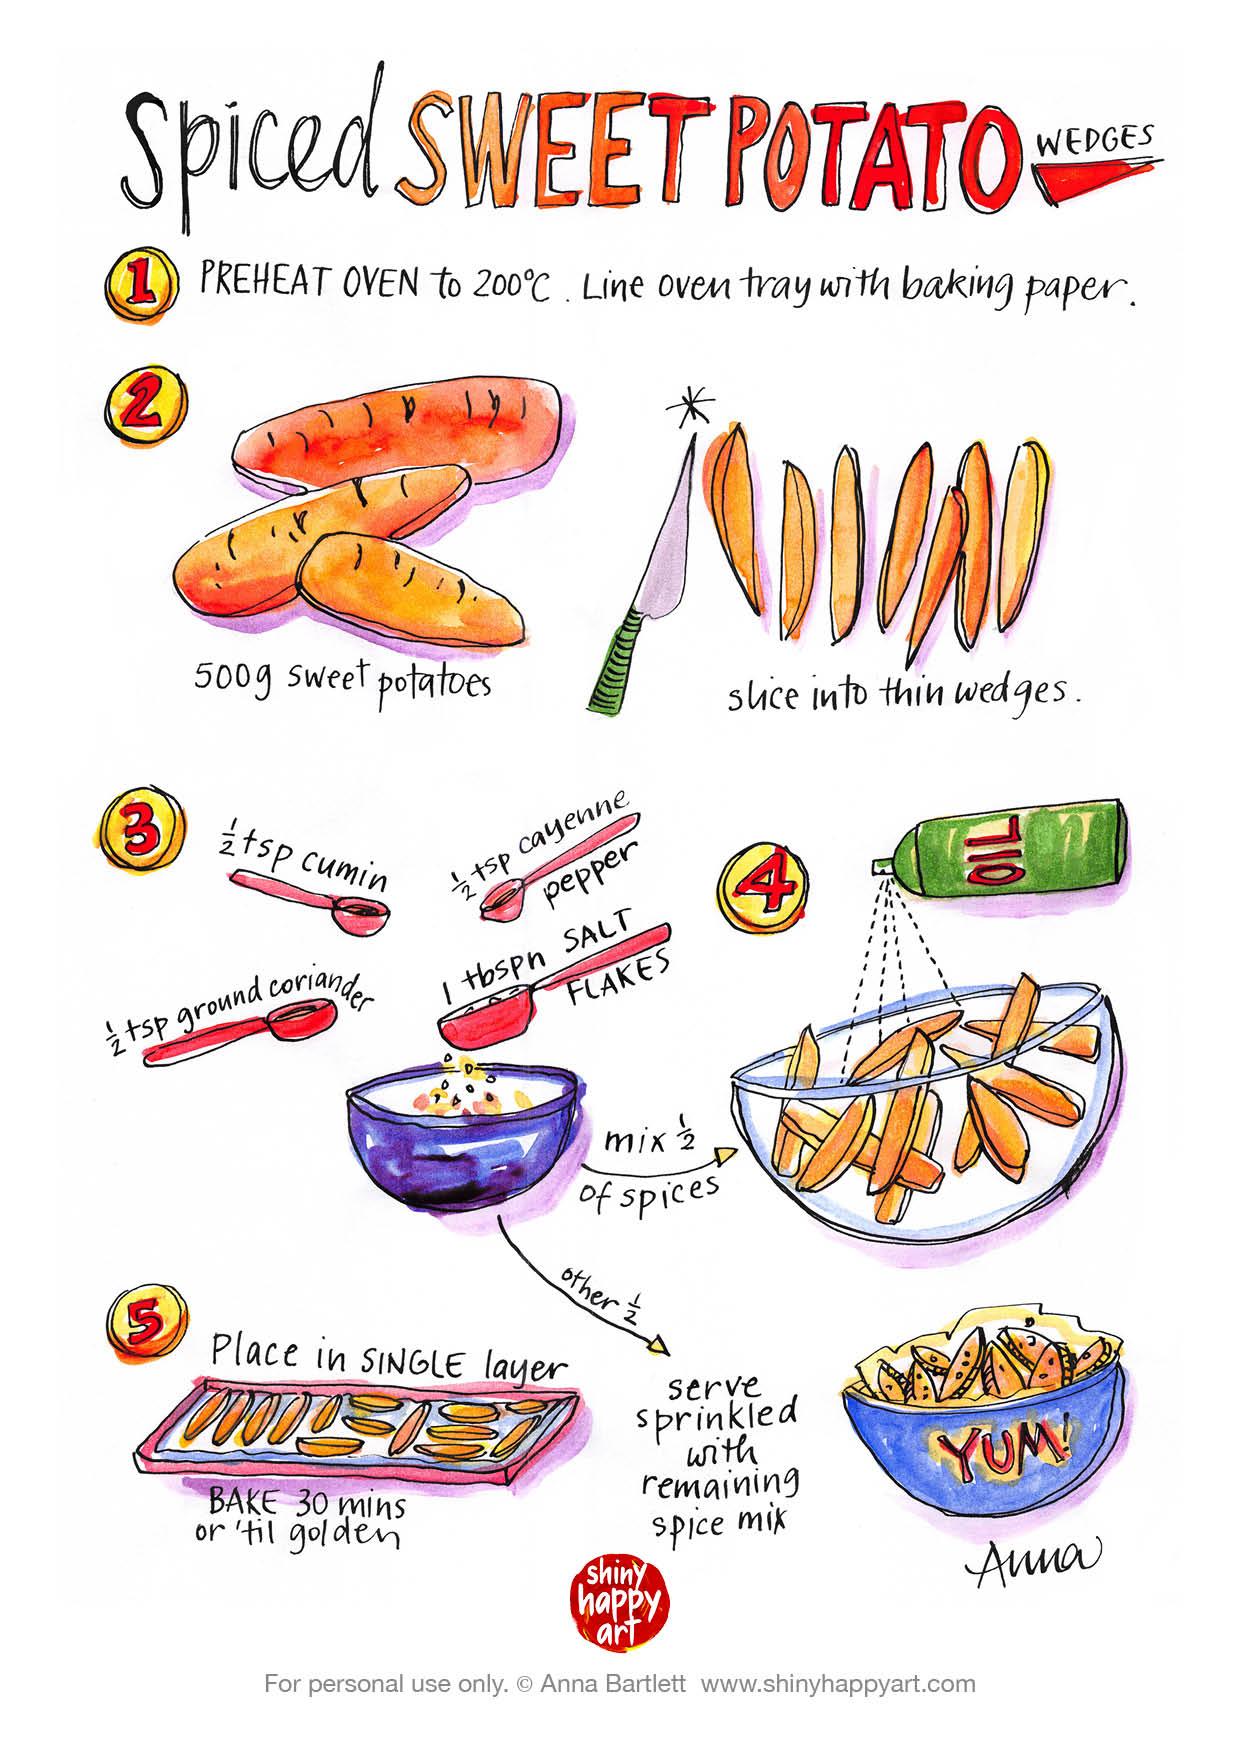 Spiced Sweet Potato Wedges by Shiny Happy Art